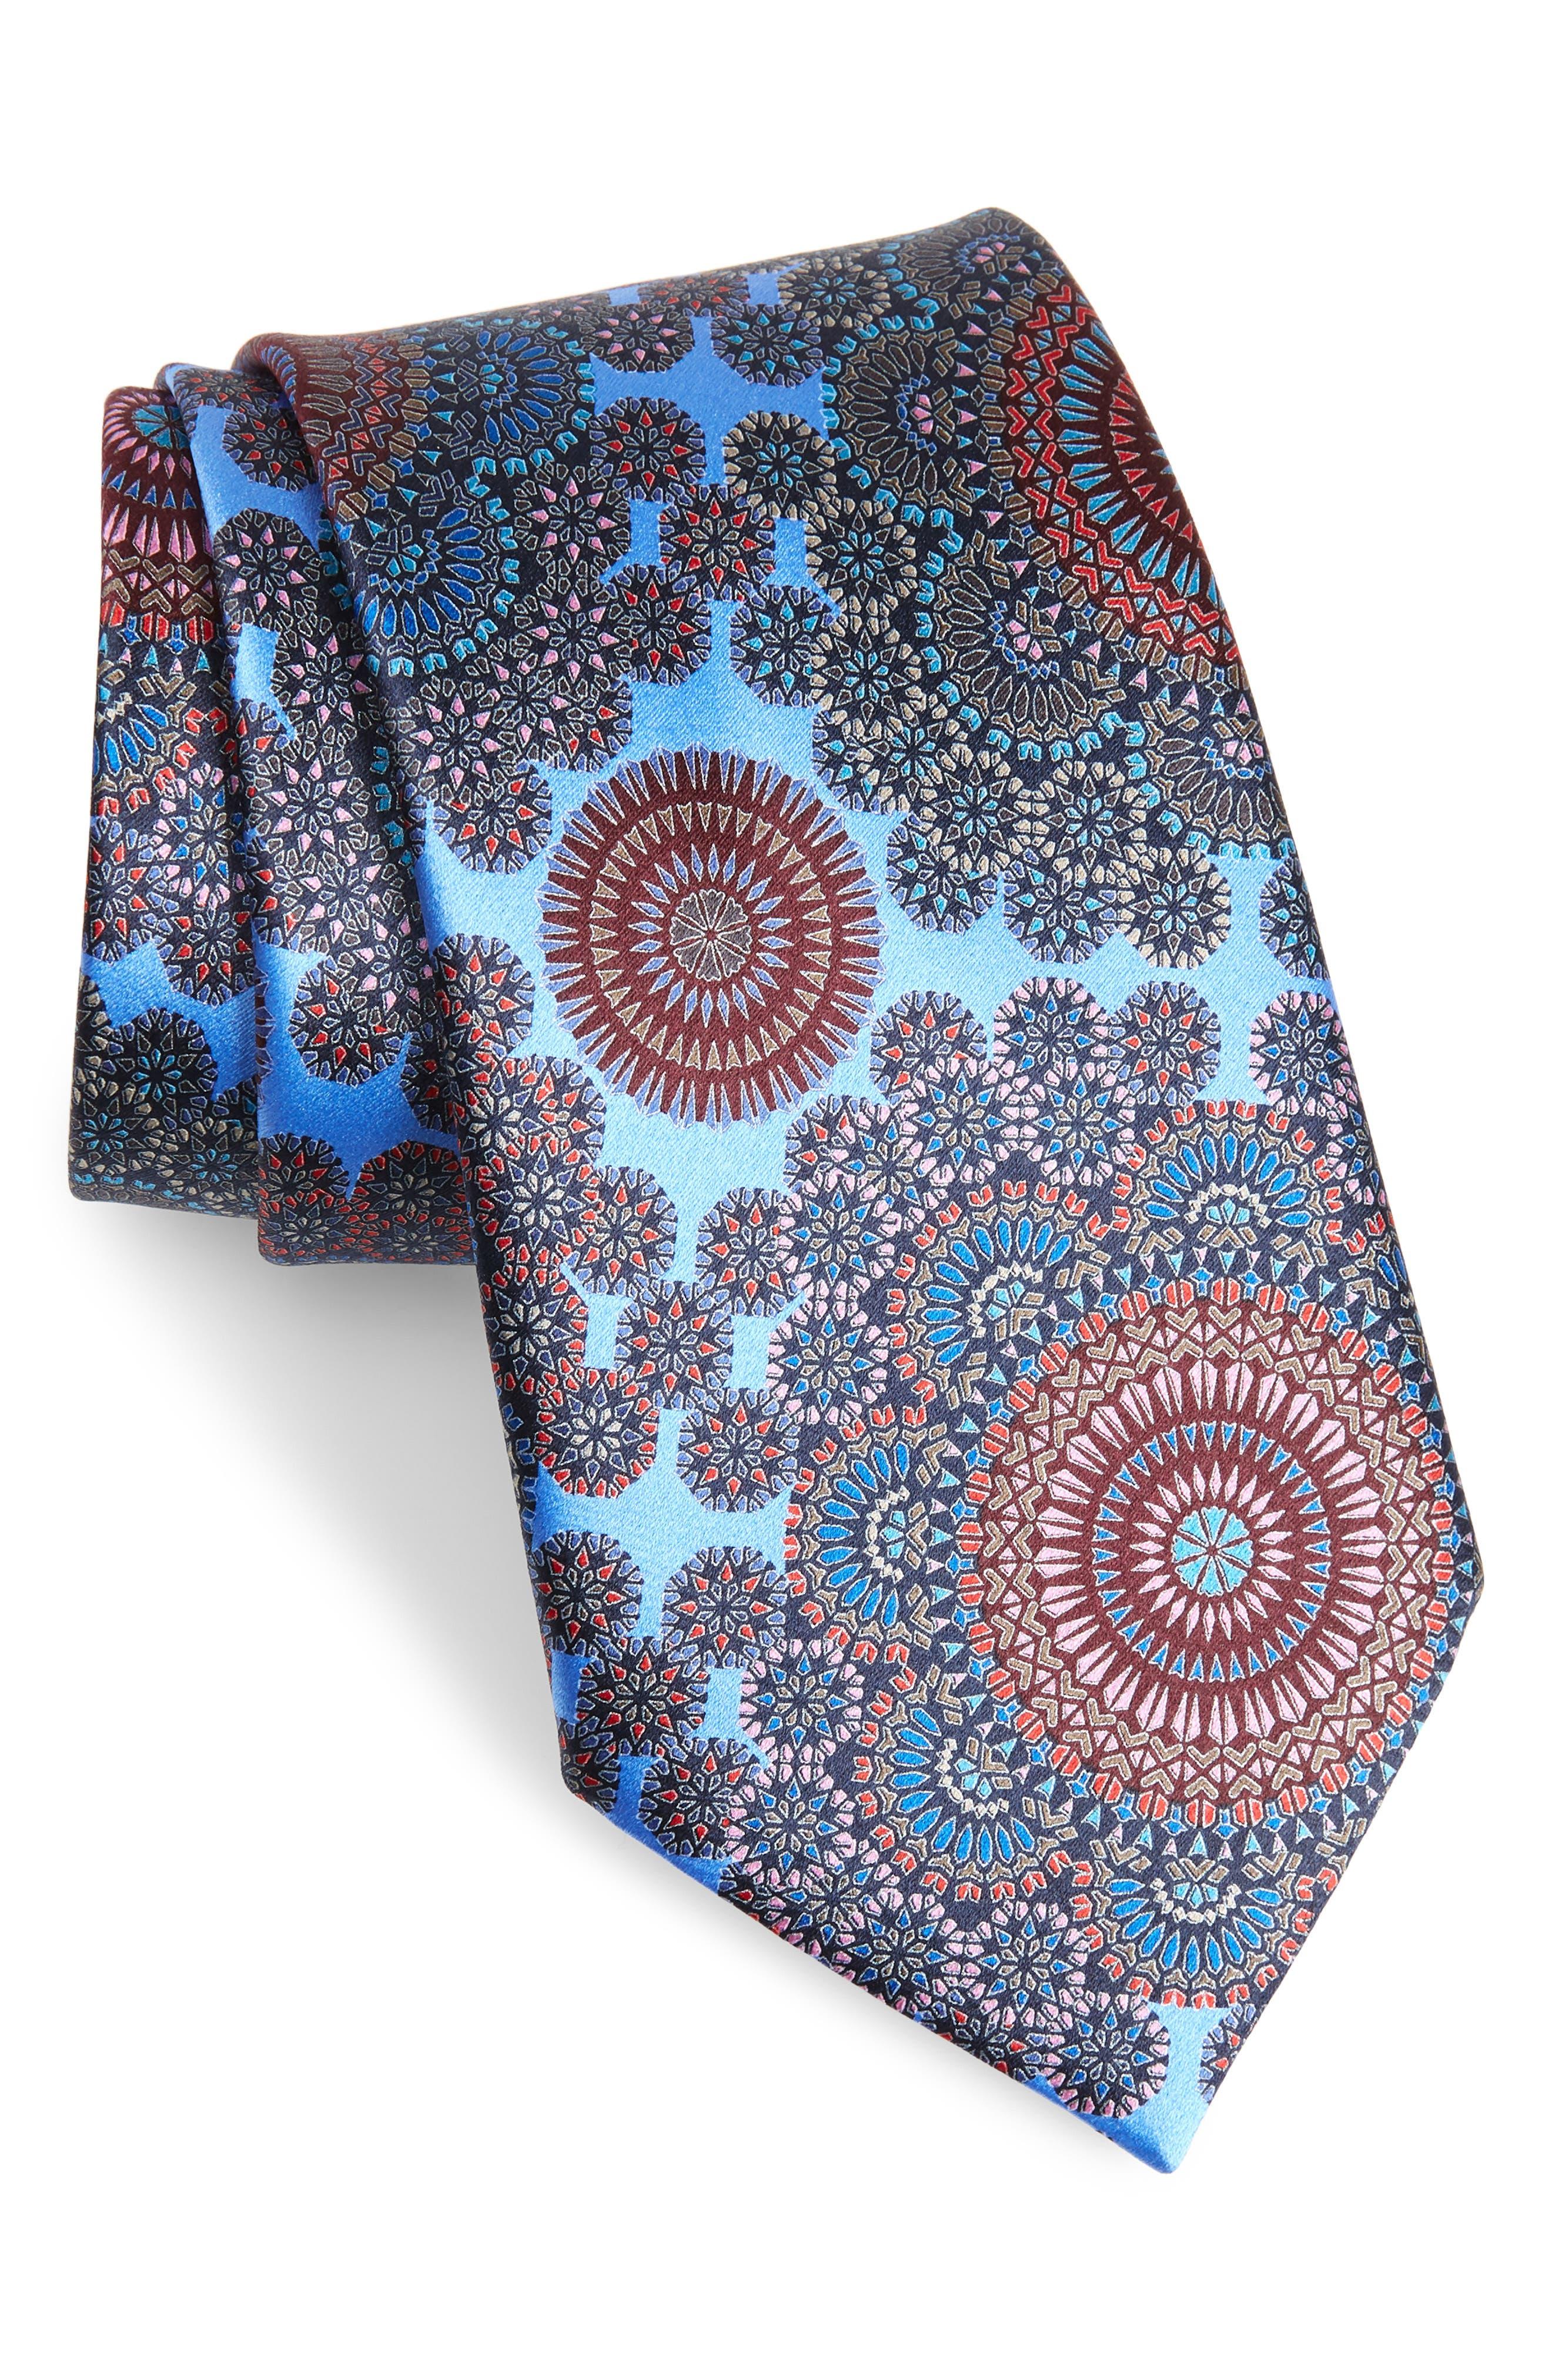 Quindici + Quindici Medallion Silk Tie,                             Main thumbnail 1, color,                             BLUE